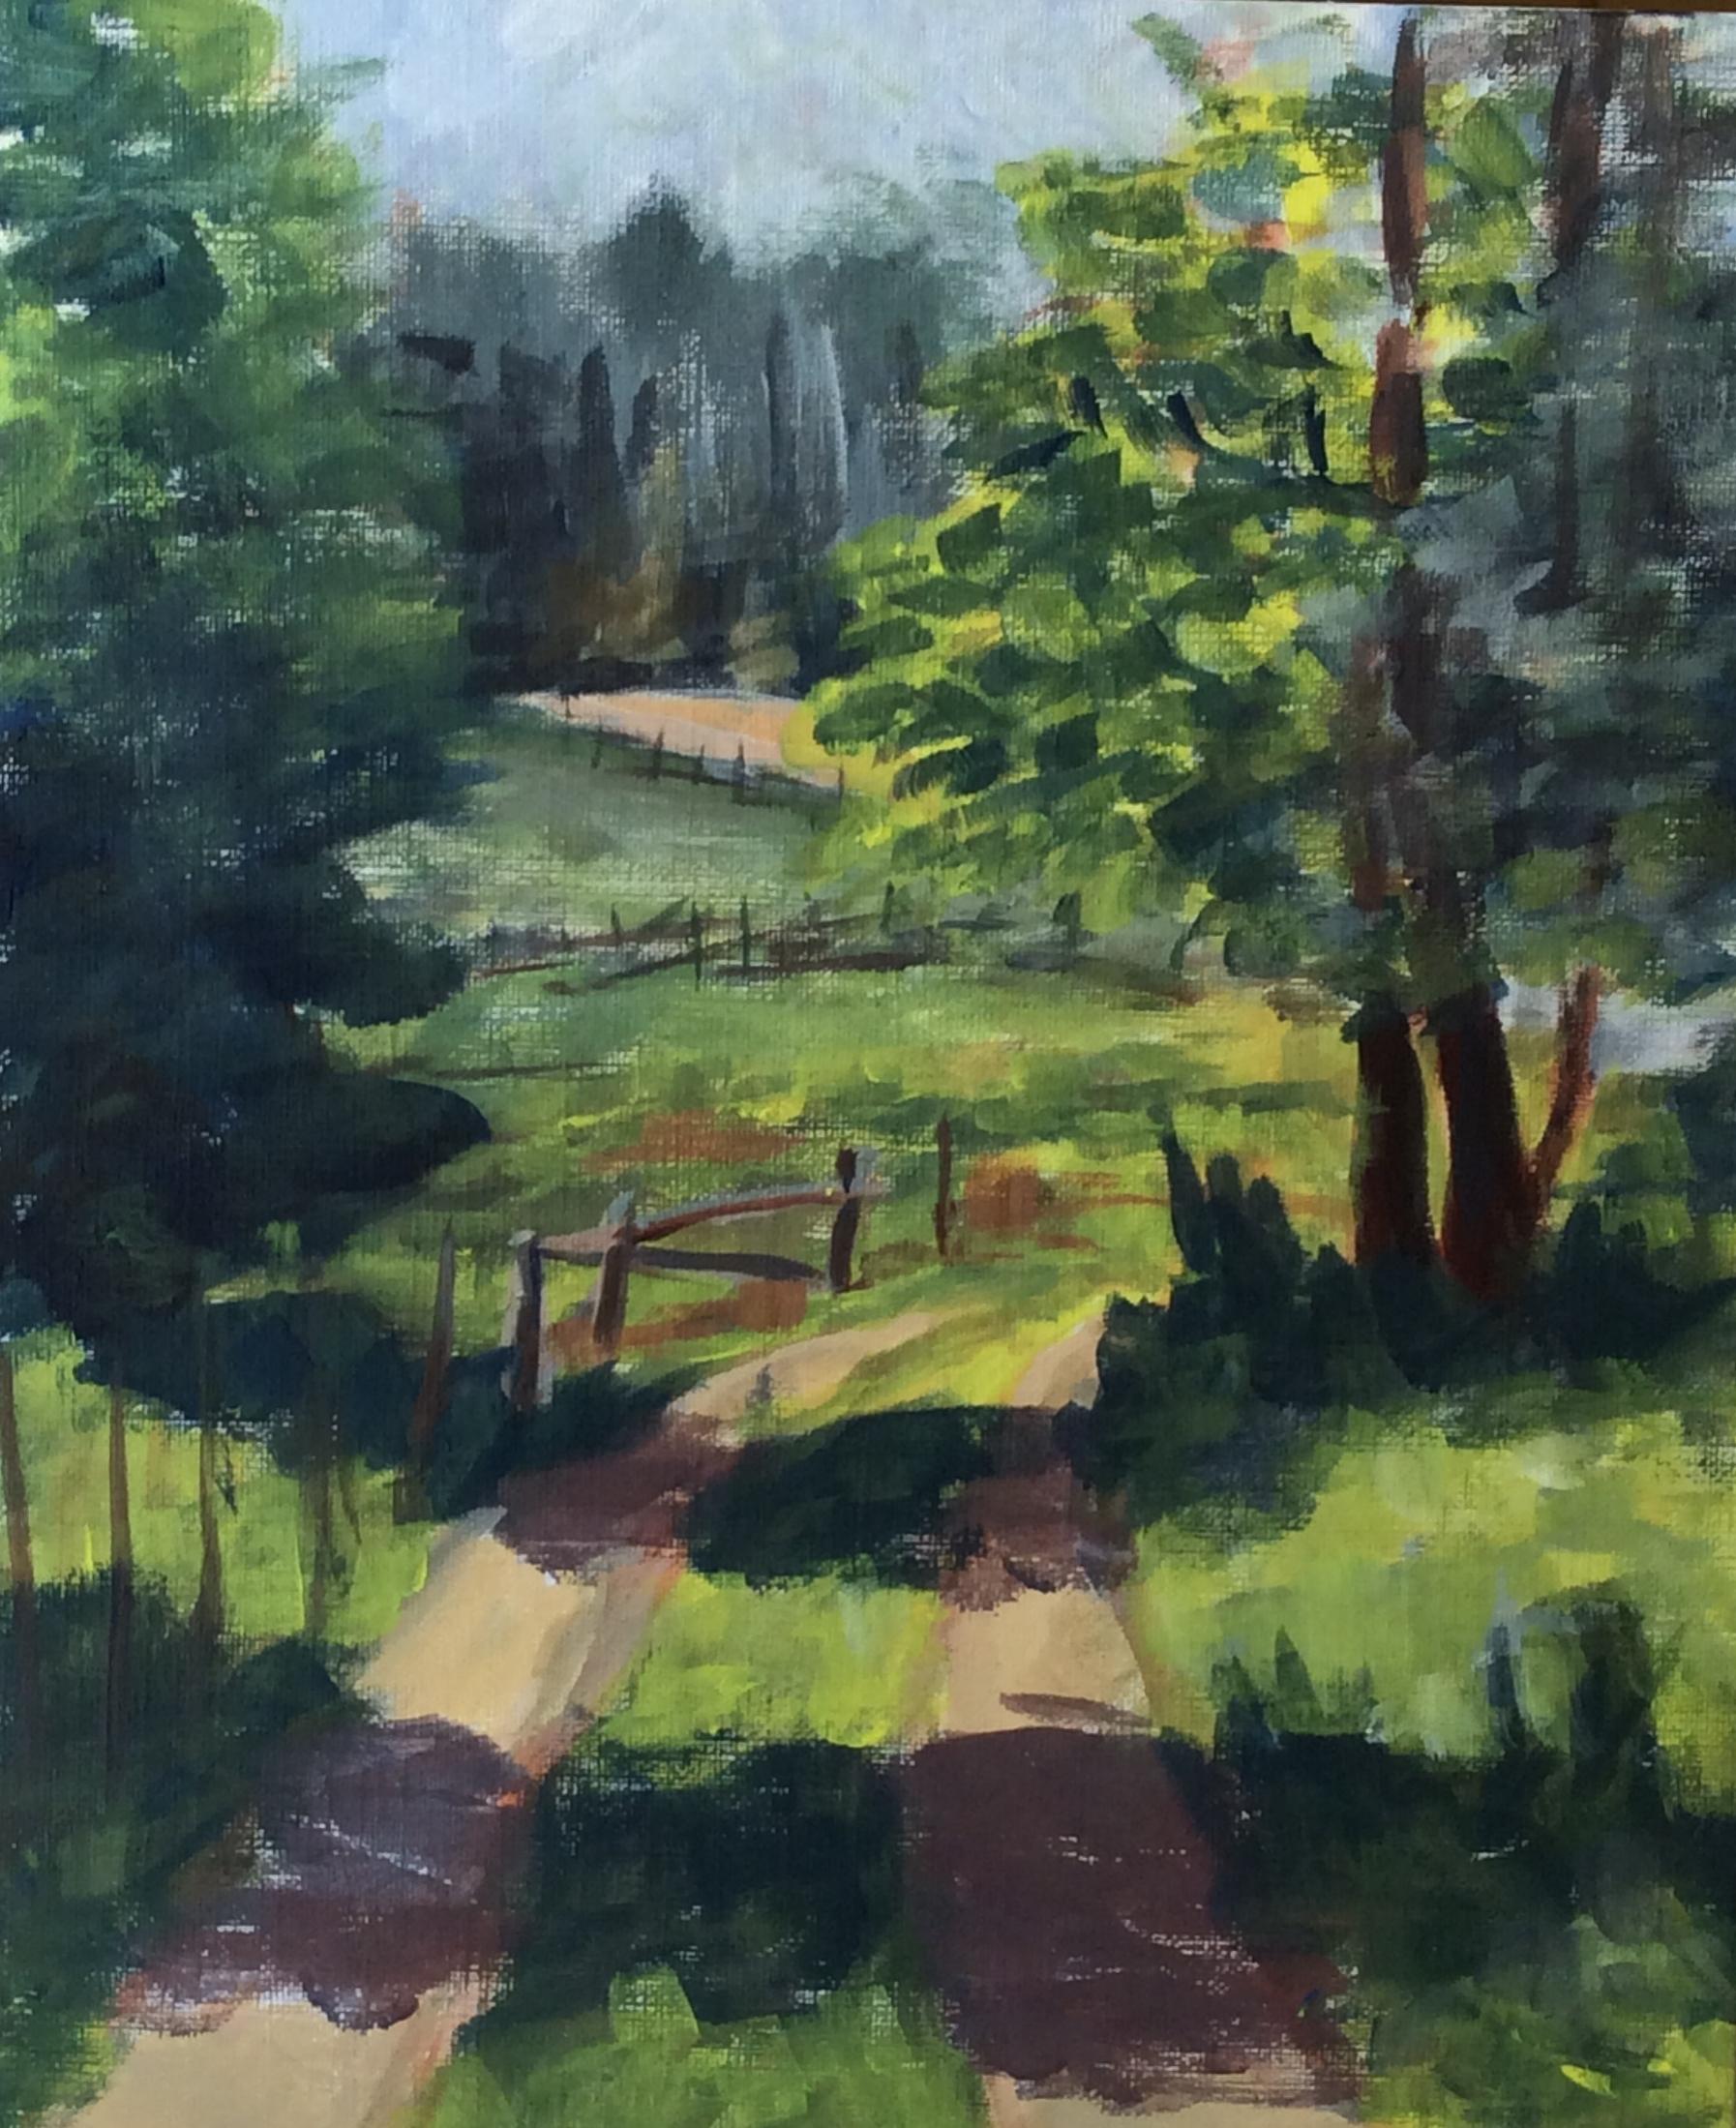 Timbers Road   Acrylic 10 x 8